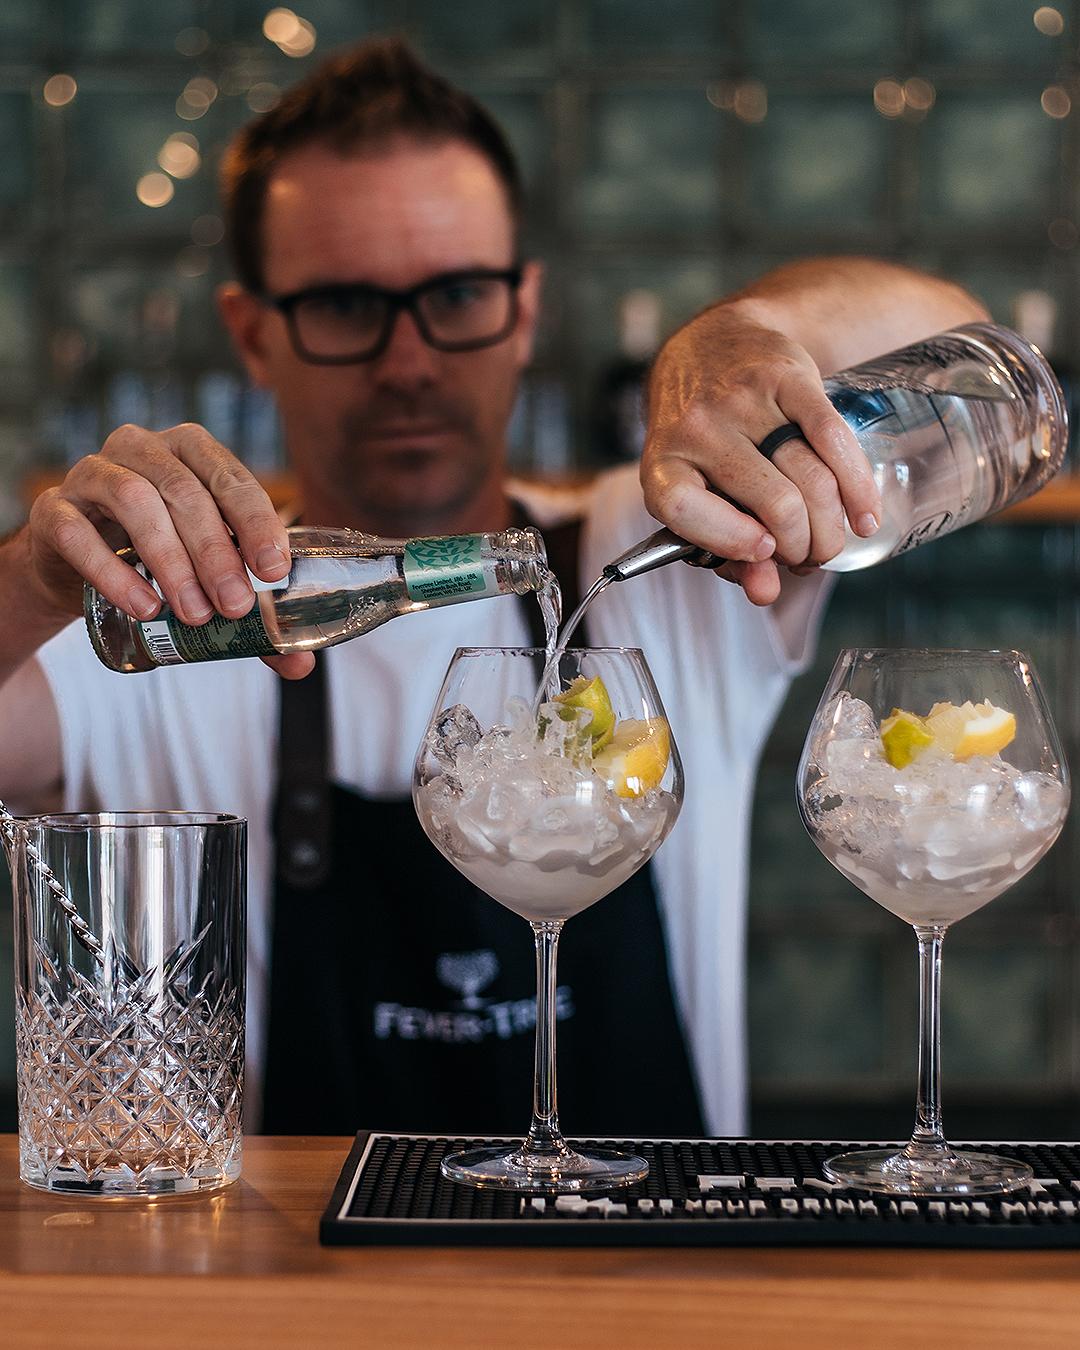 A bartender mixes drinks in an artful way.